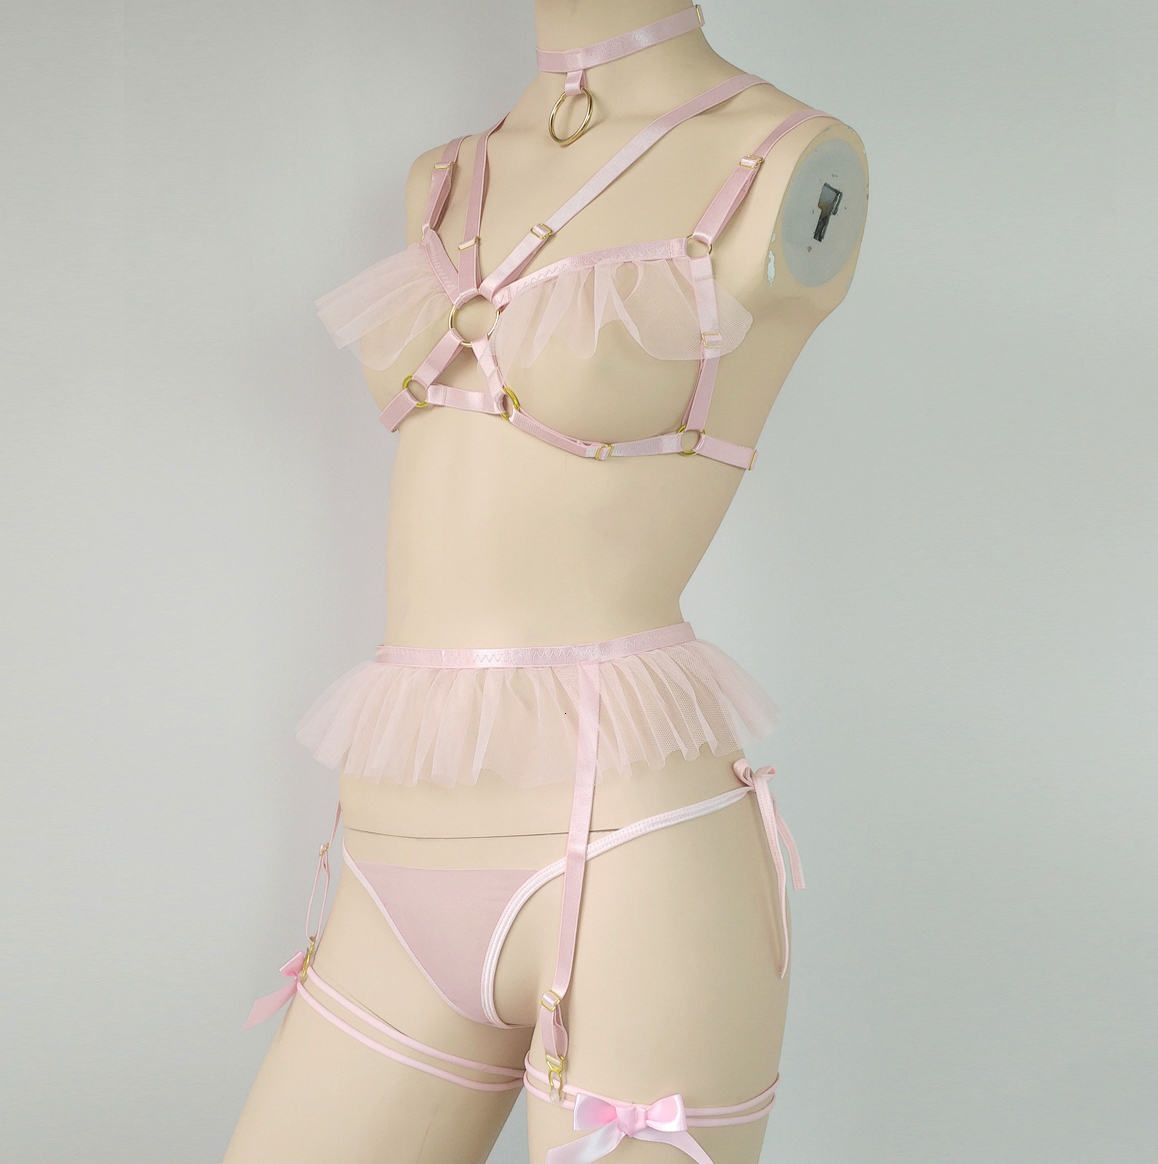 Leather Harness 5 Piece Set Ruffle Garters Belts Sexy Women Waist To Leg Bondage Cage Straps Bra Garter Body Belts Chest